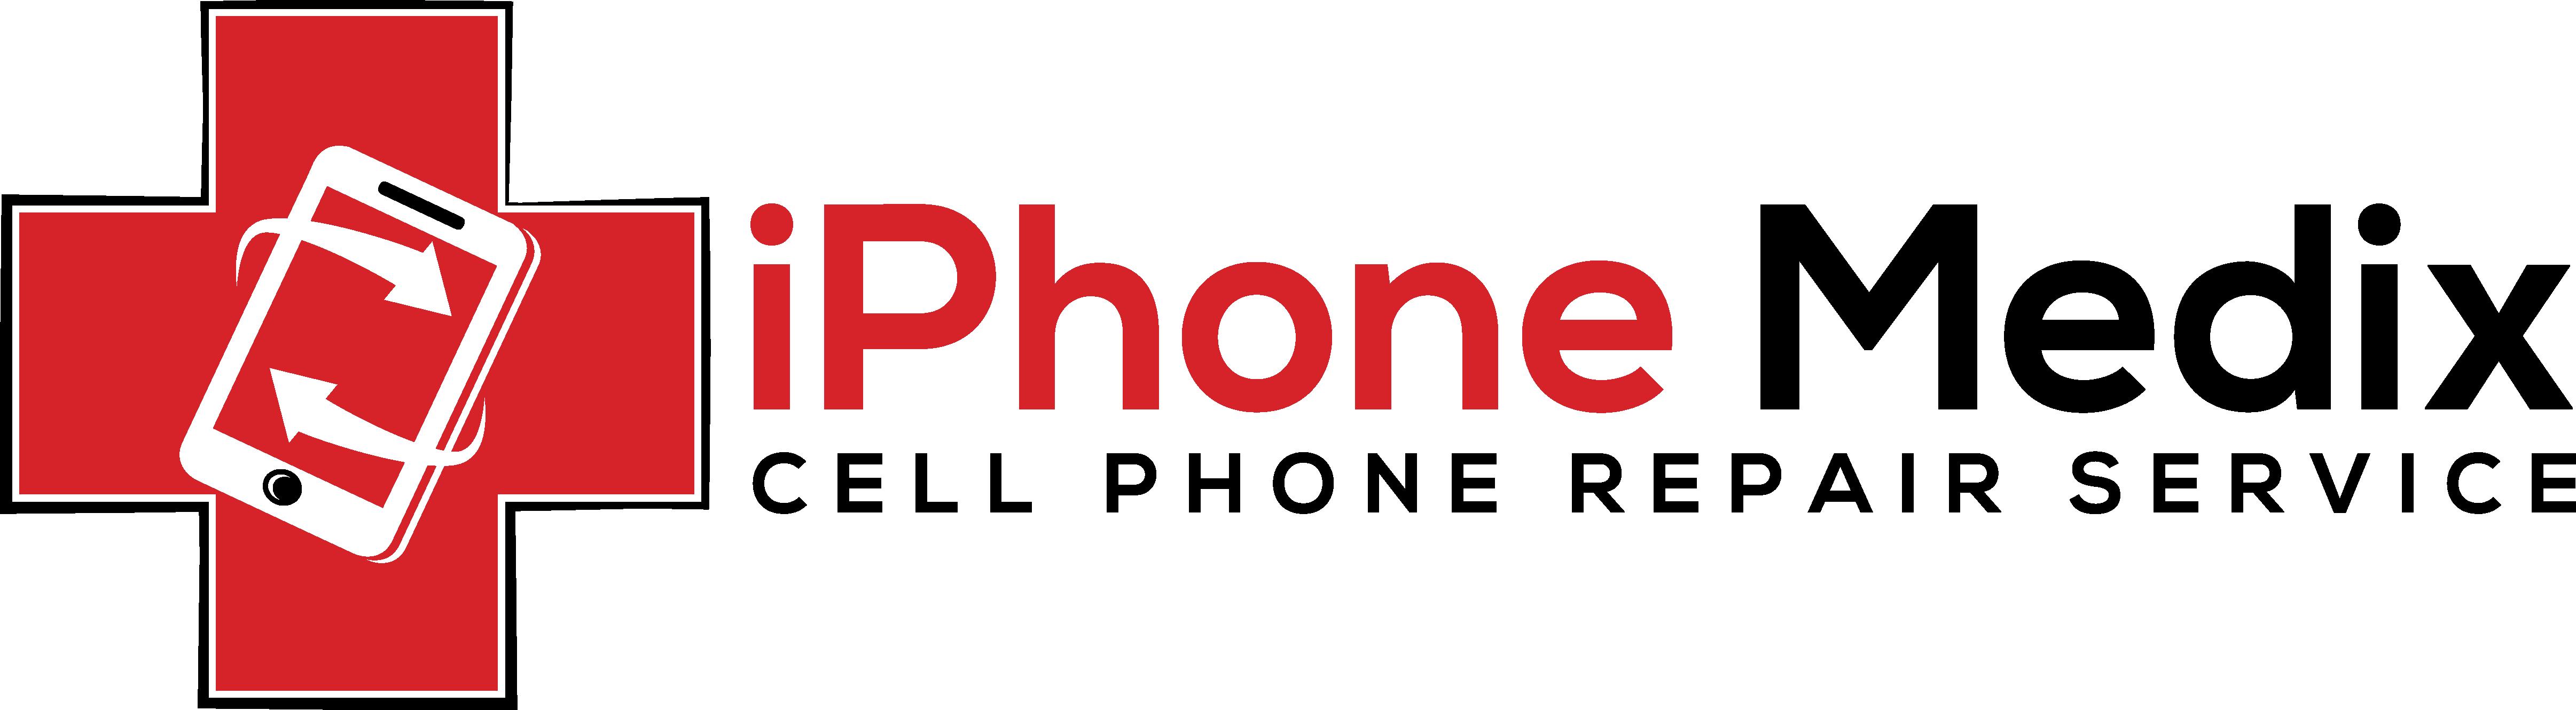 iPhoneMedix Cellphone Repair Service